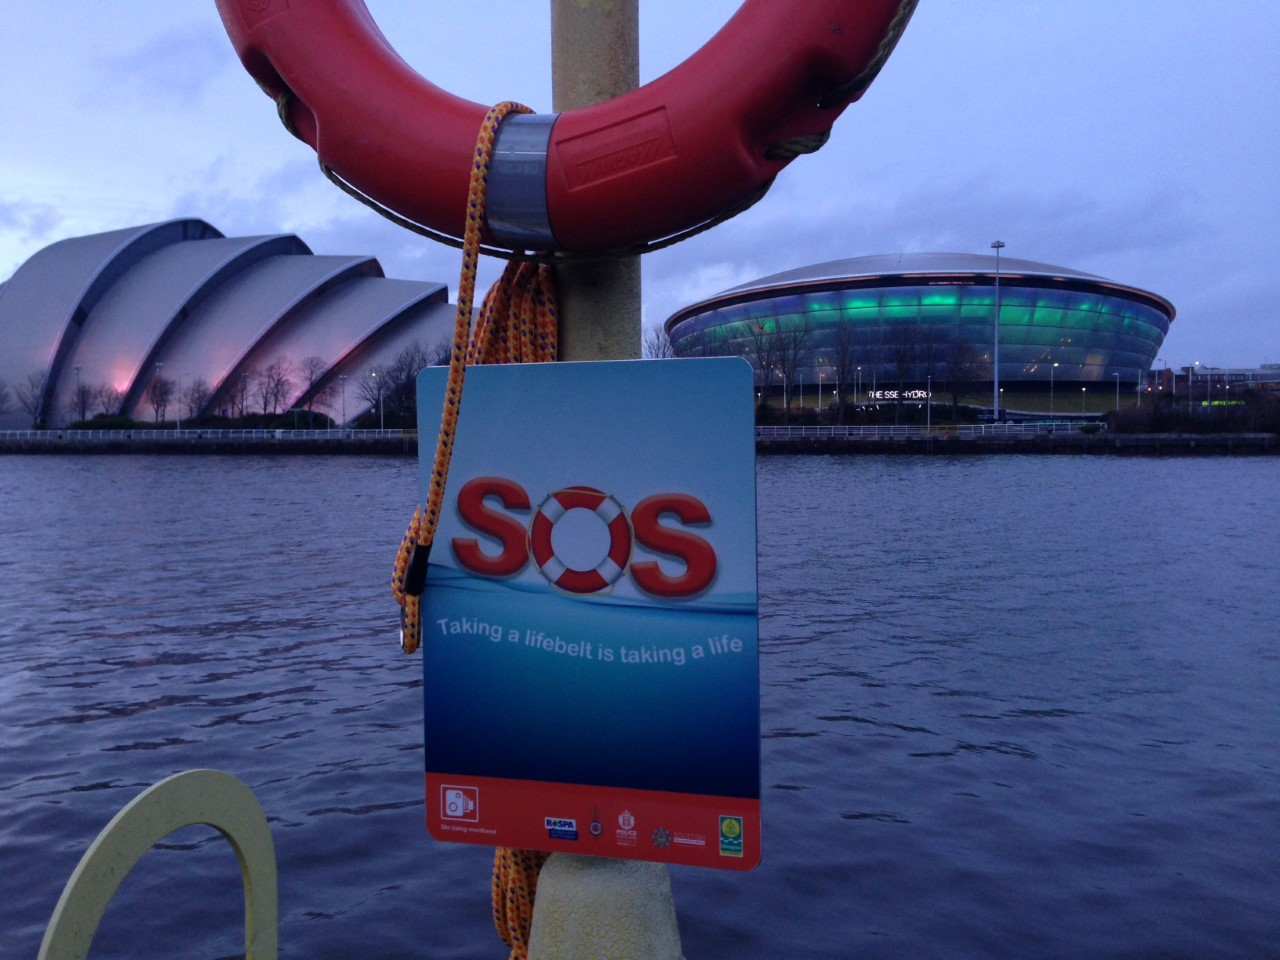 Glasgow Exhibition Centre - SOS Lifebuoy